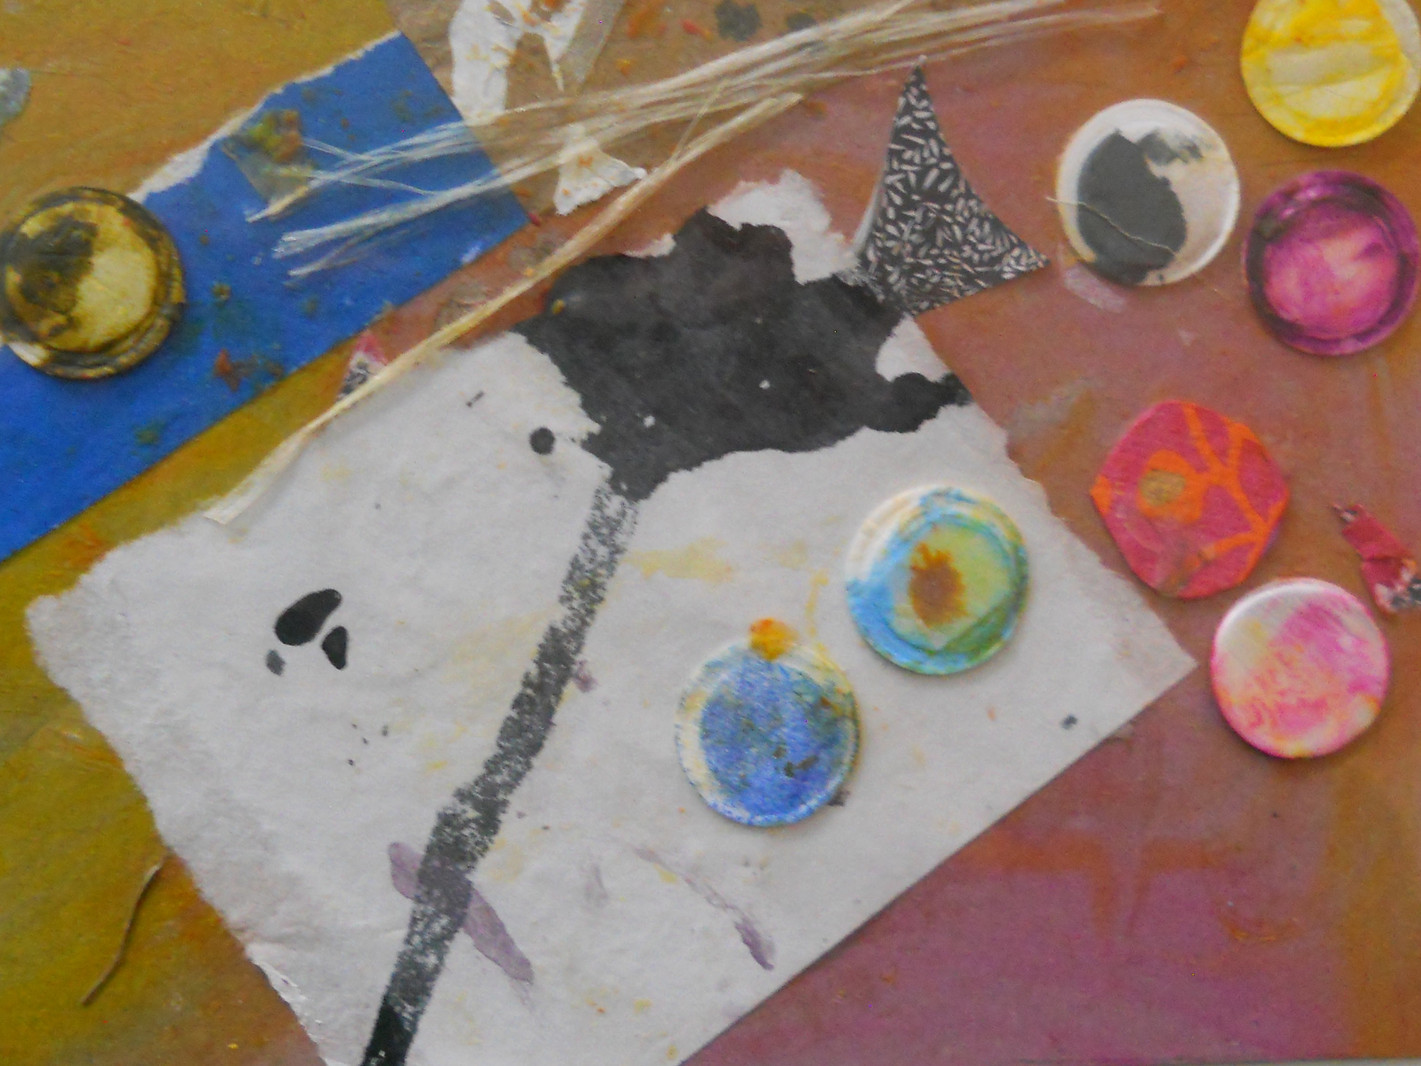 The Painter's Equipment